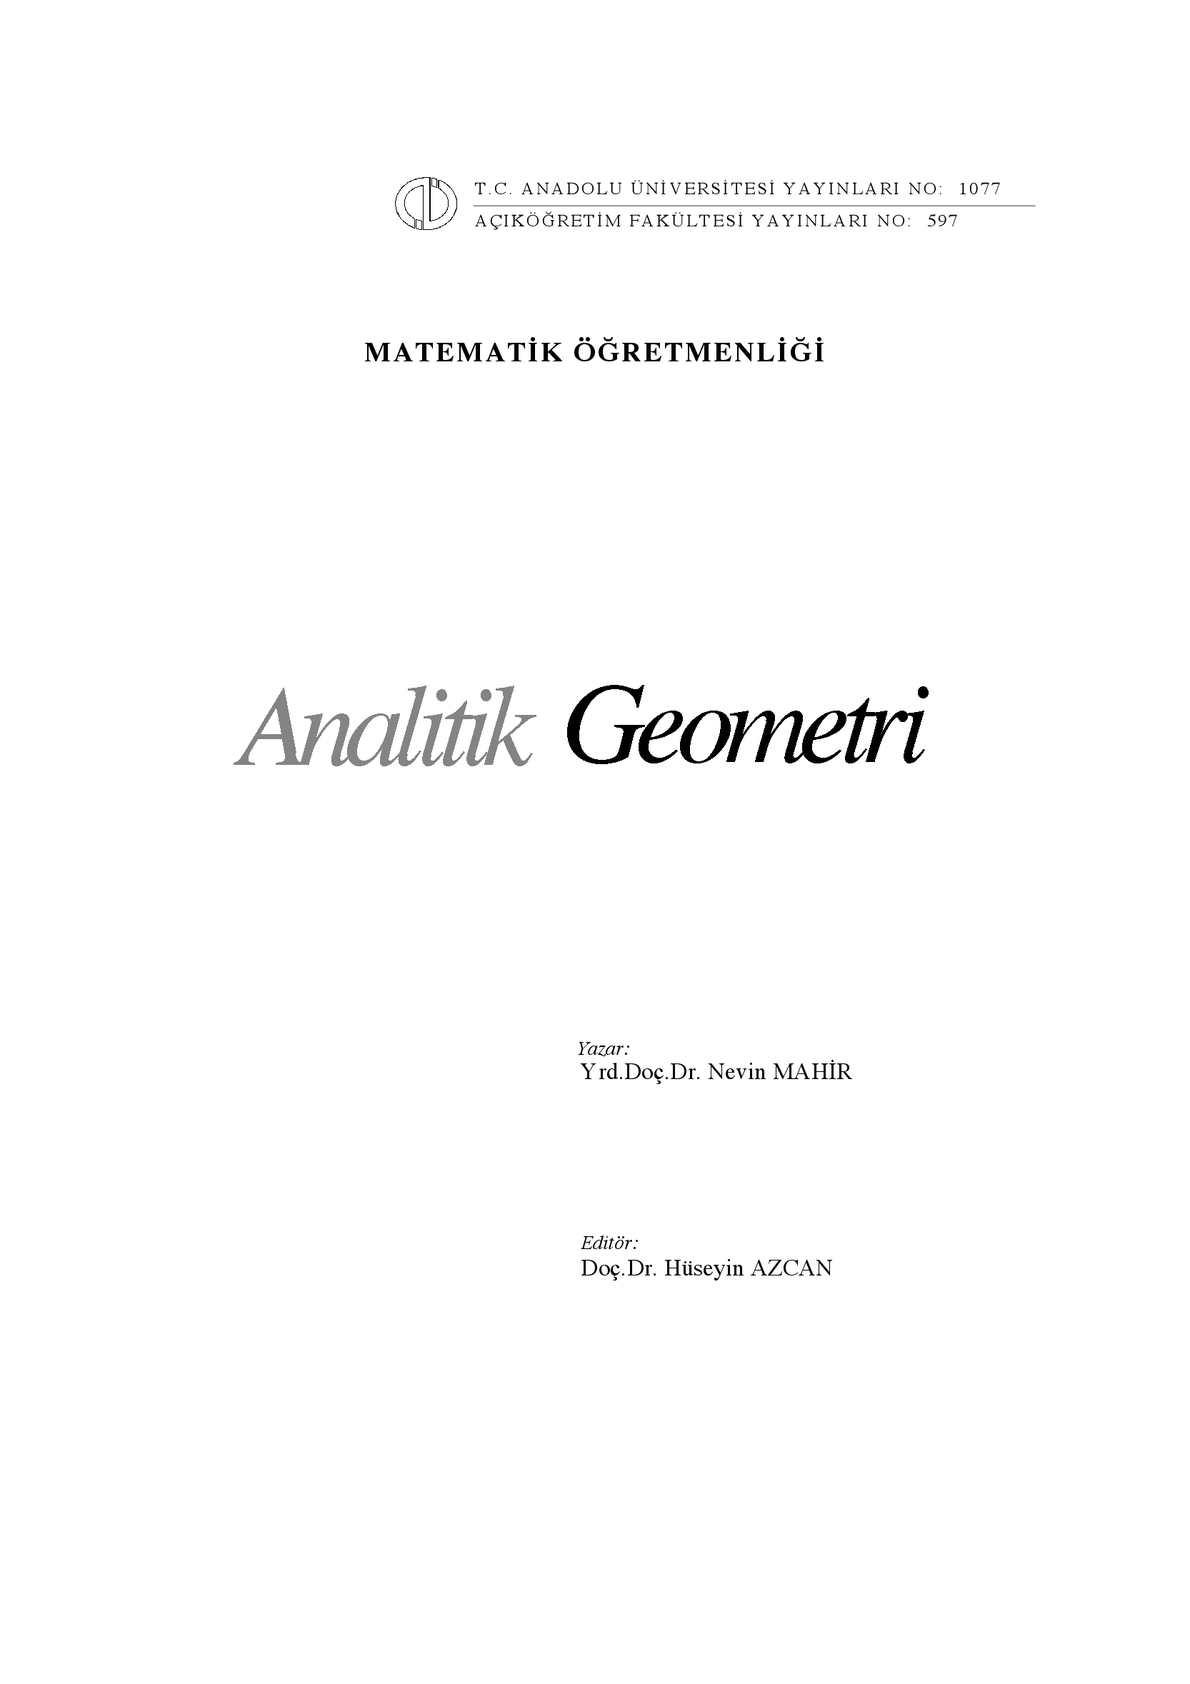 Analitik Geometri - Yrd. Doç. Dr. Nevin Mahir ft Doç. Dr. Hüseyin Azcan